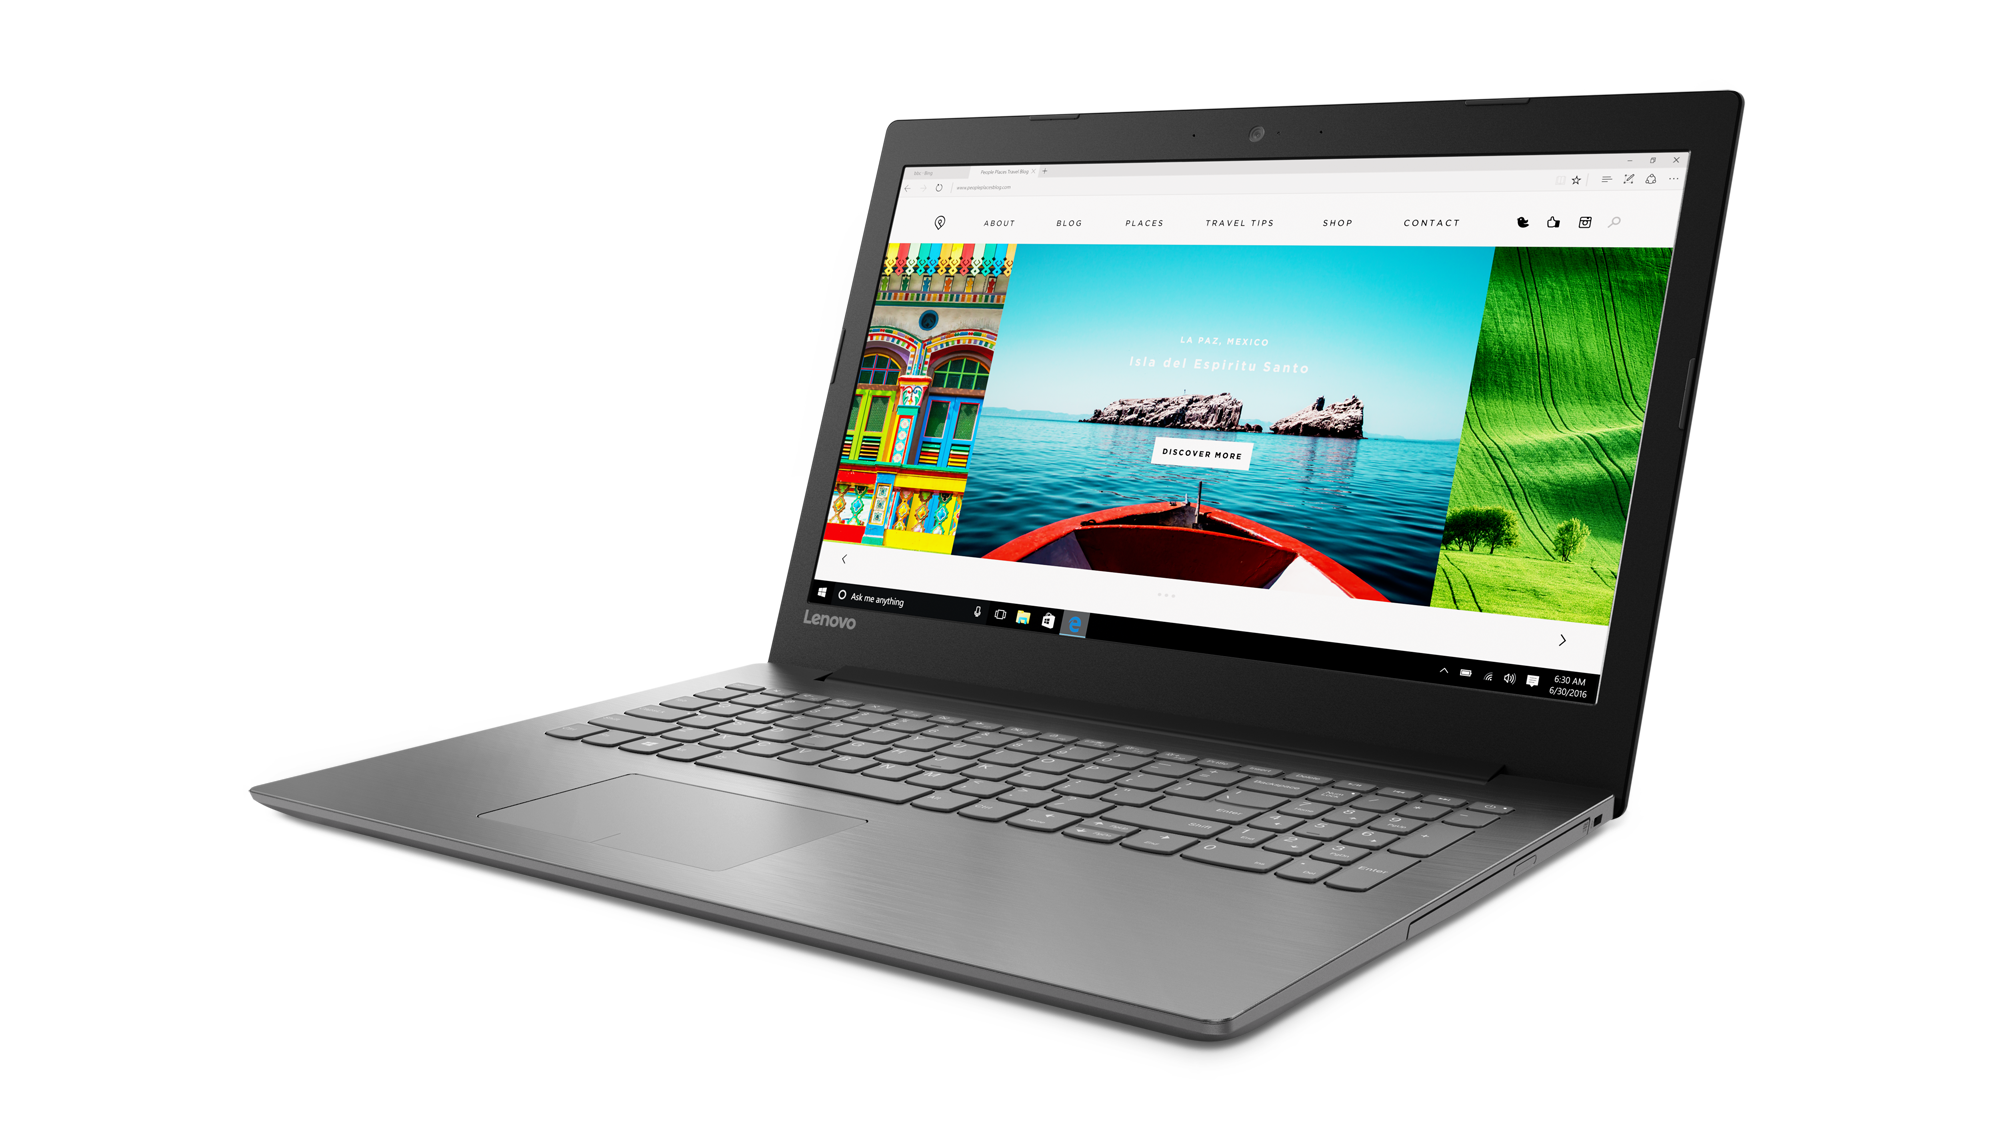 "Lenovo IdeaPad 320-15IKBA i5-7200U 3,10GHz/6GB/SSD 256GB/15,6"" FHD/AG/Radeon 2GB/WIN10 černá 80YE000NCK"